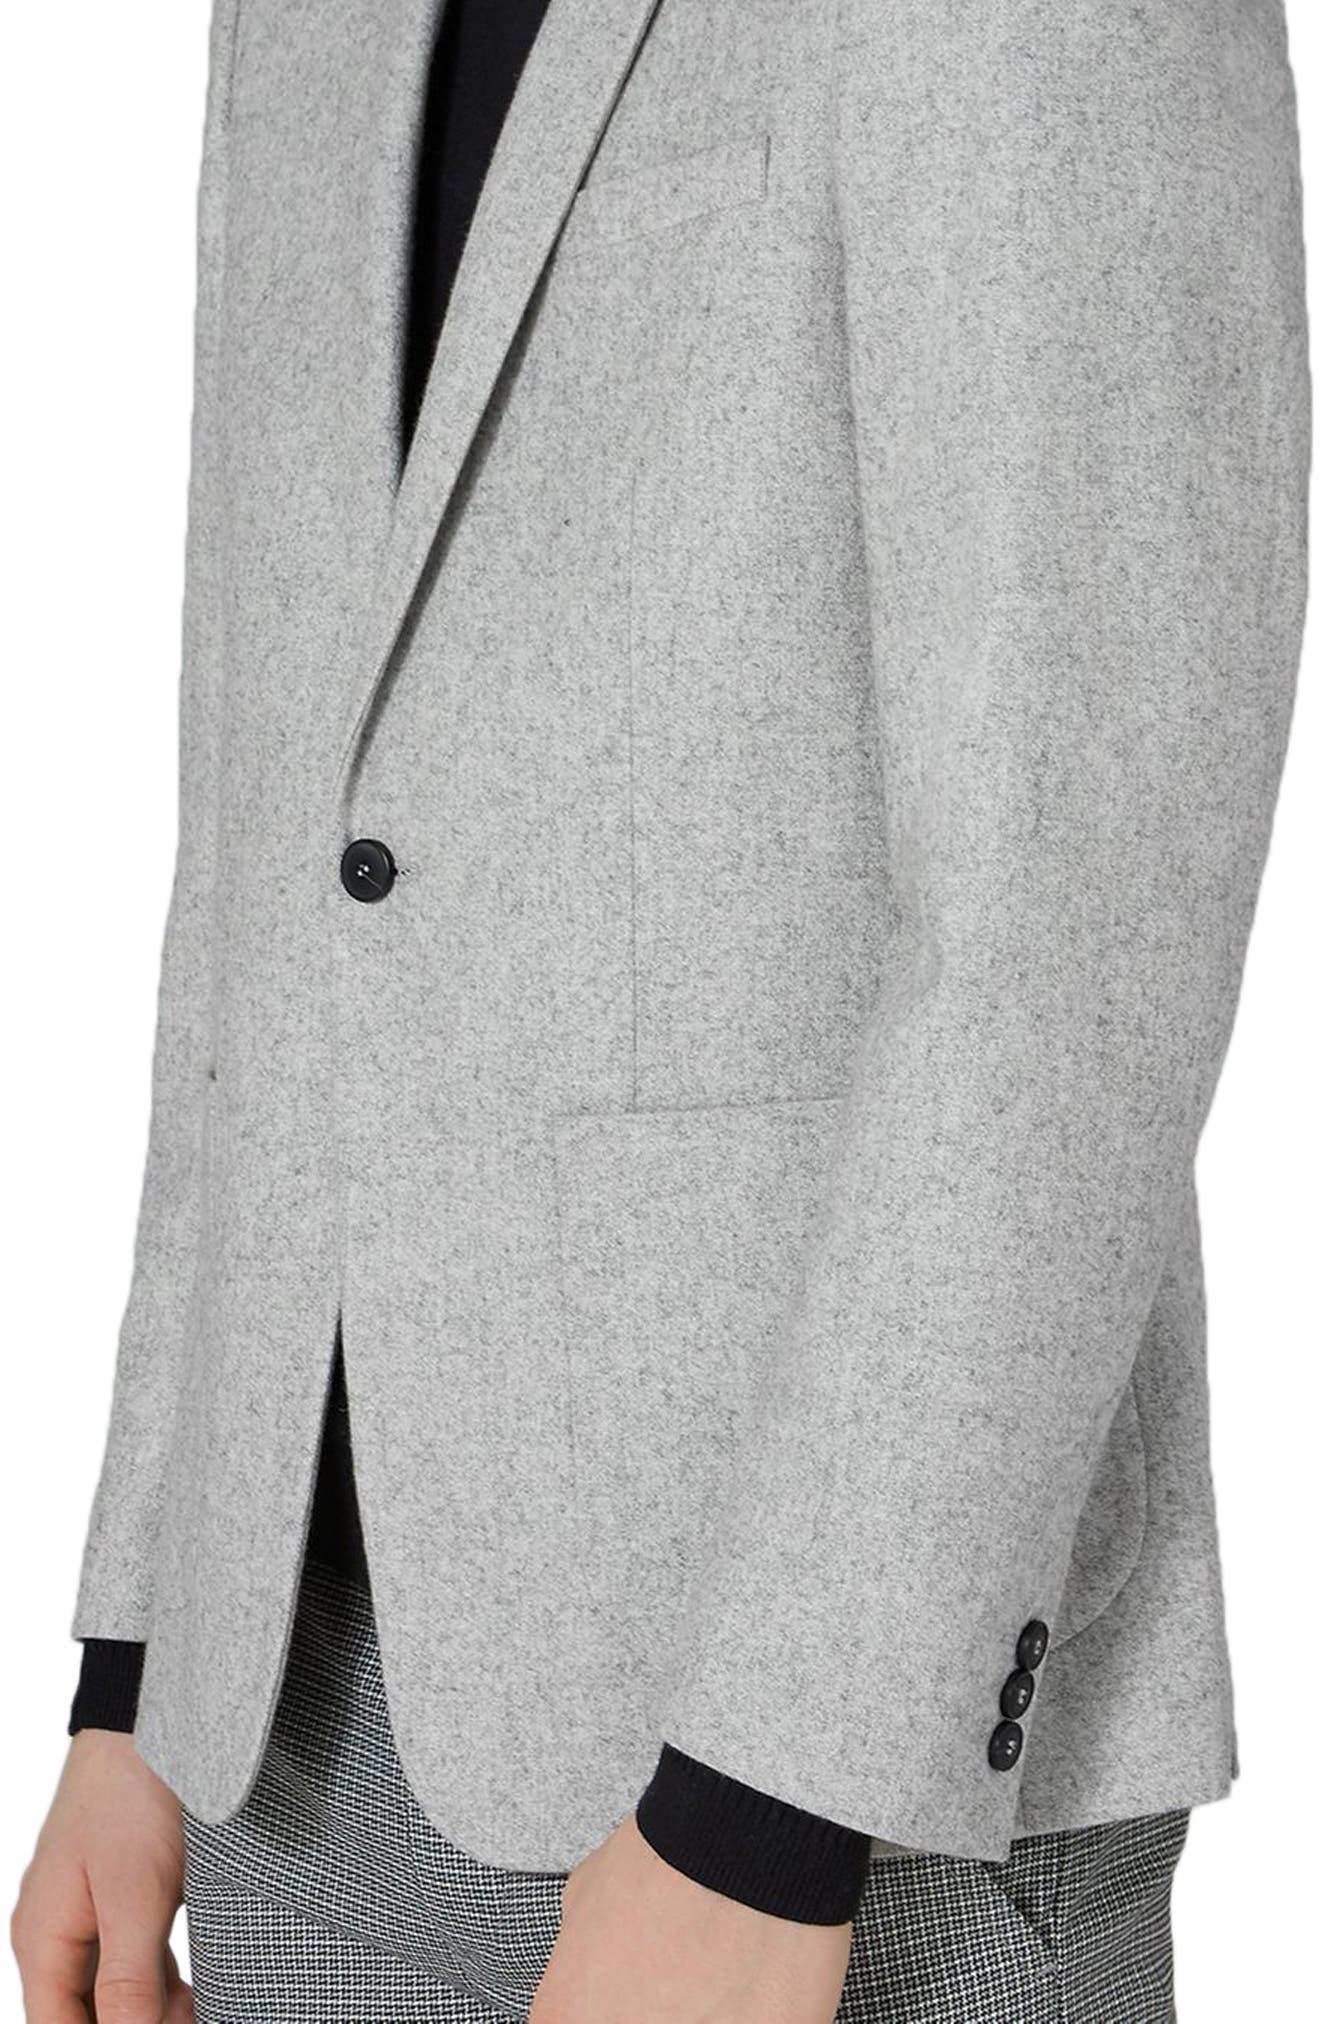 Murdoch One-Button Jacket,                             Alternate thumbnail 3, color,                             LIGHT GREY